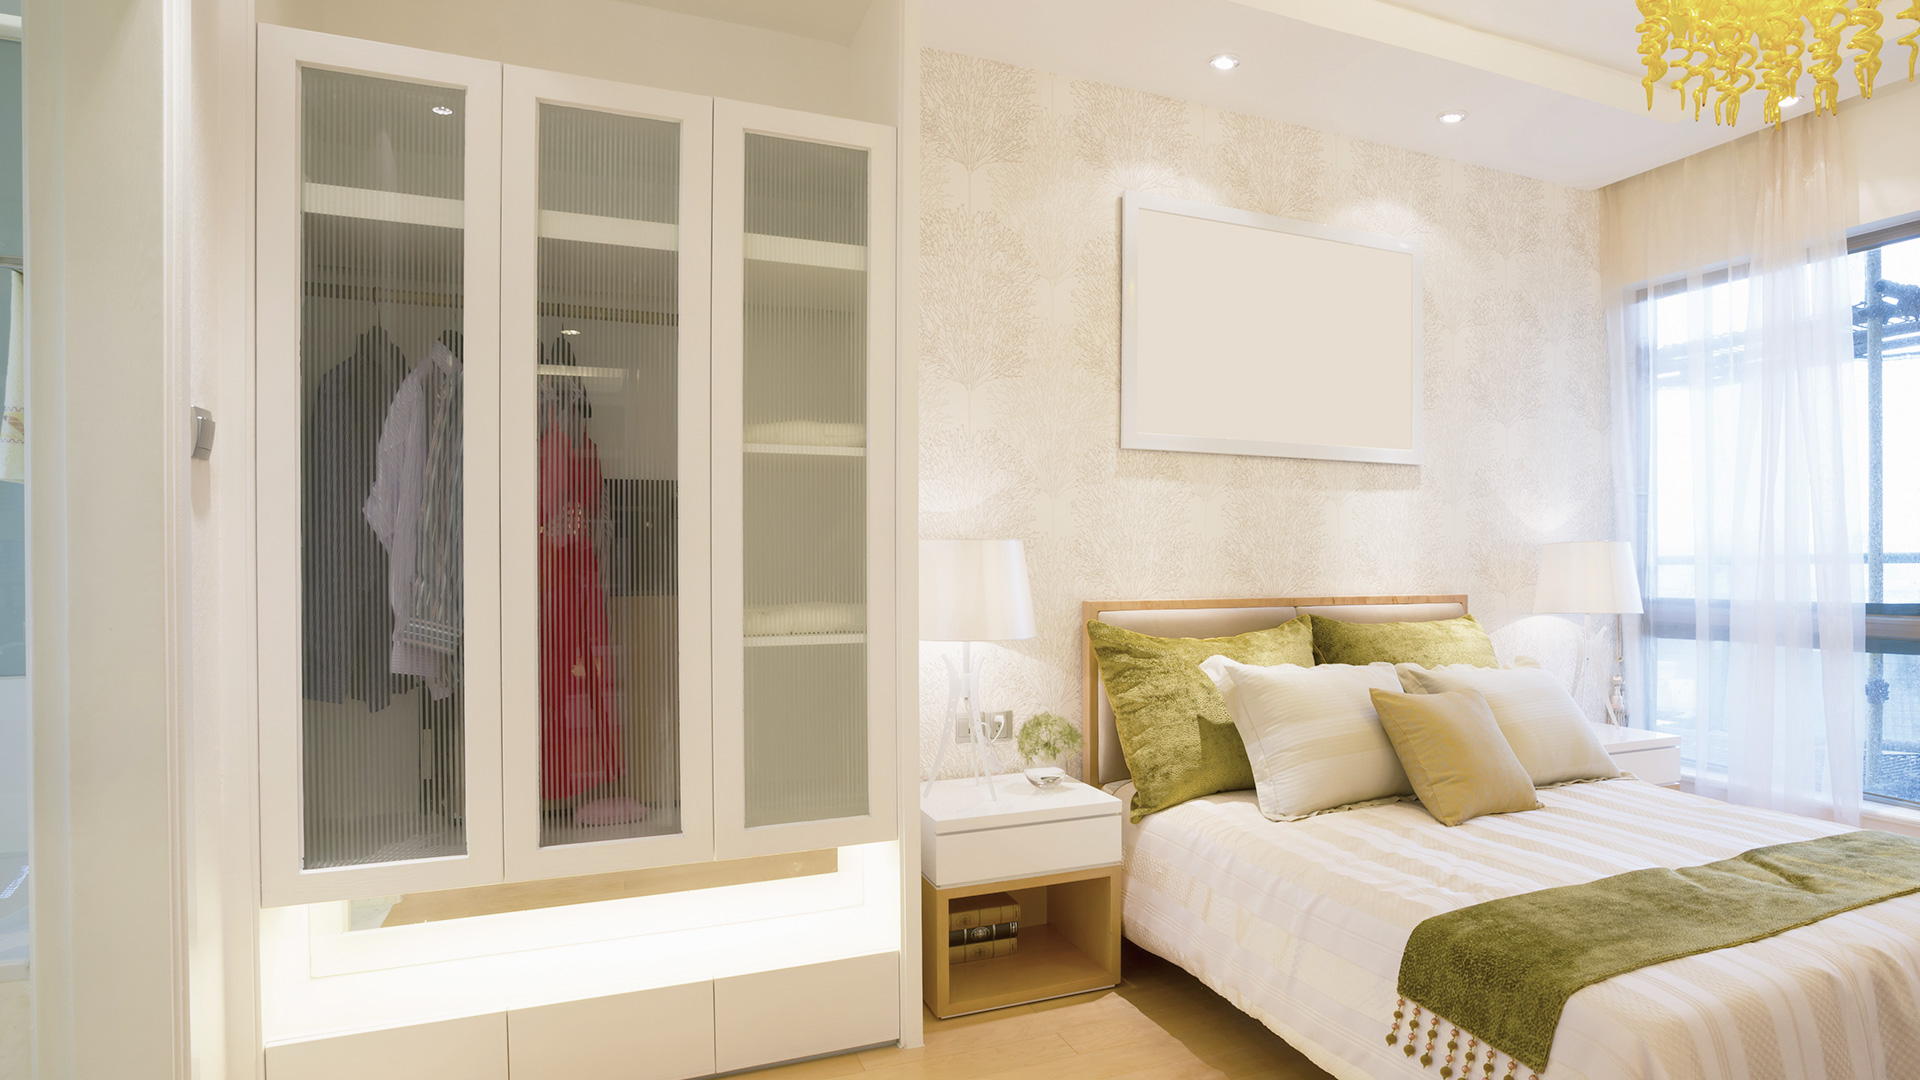 bespoke shaker style wardrobe doors for new existing. Black Bedroom Furniture Sets. Home Design Ideas